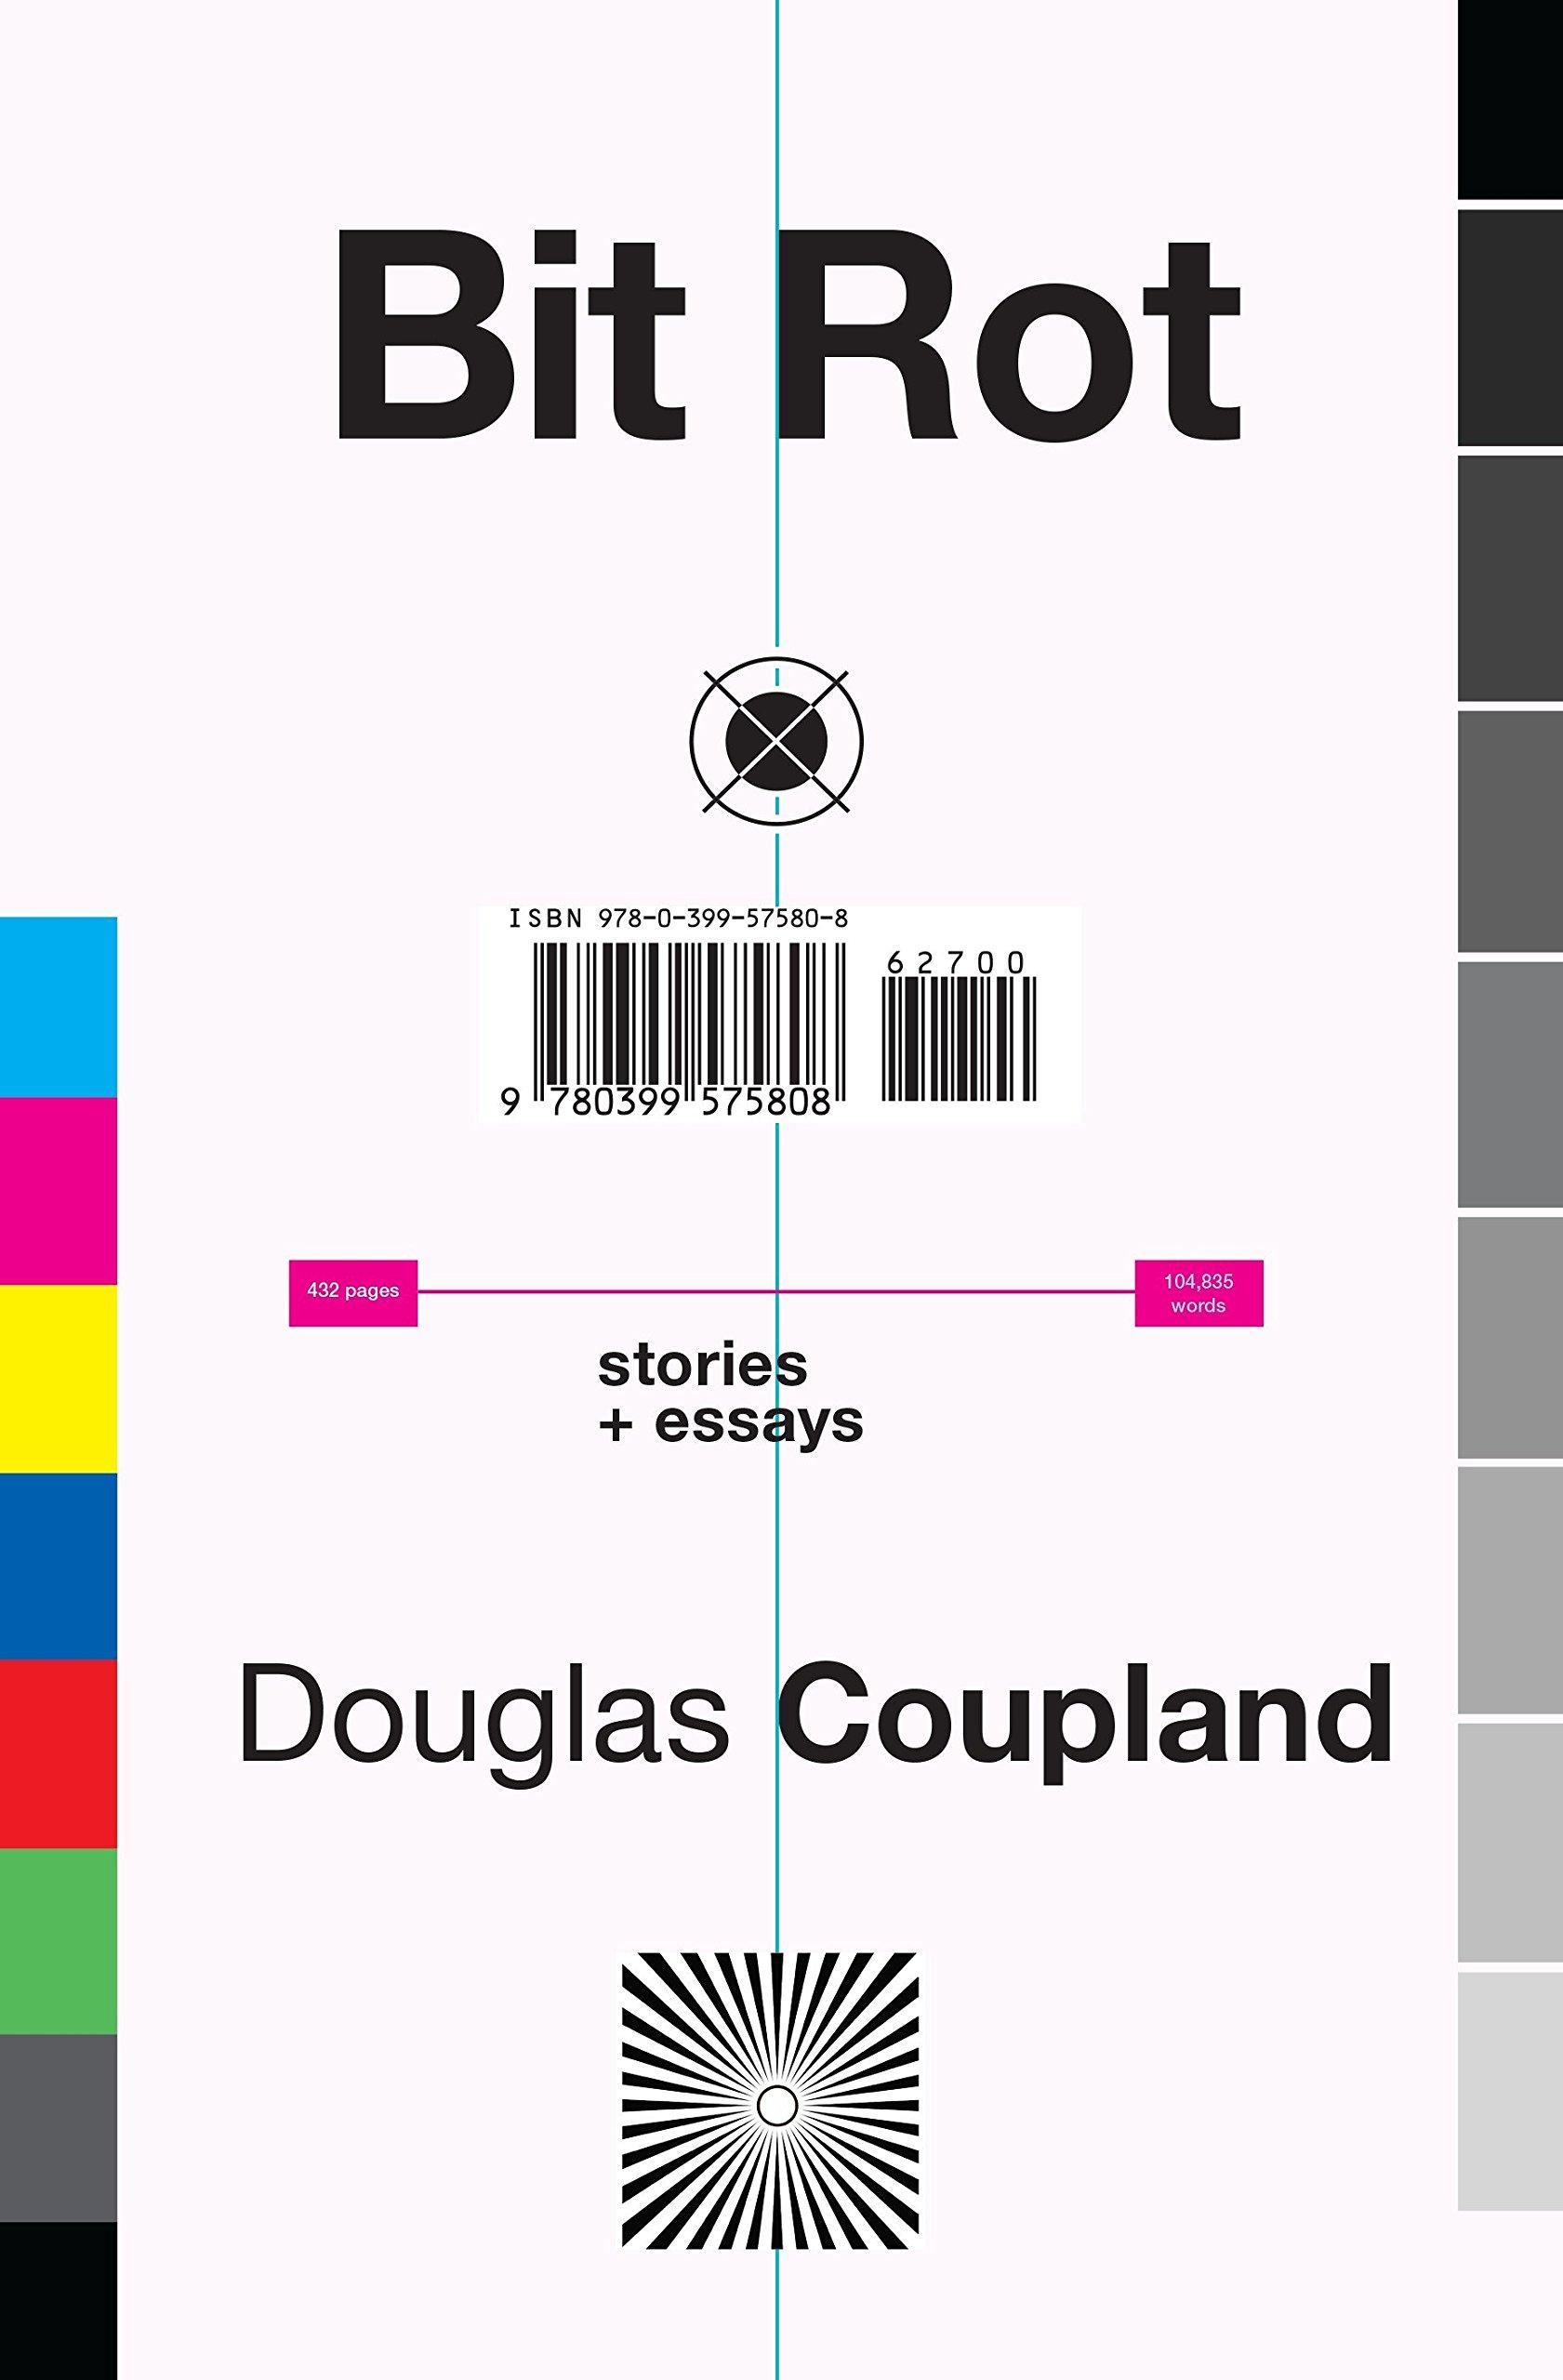 Amazon.com: Bit Rot: stories + essays (9780399575808): Douglas Coupland:  Books